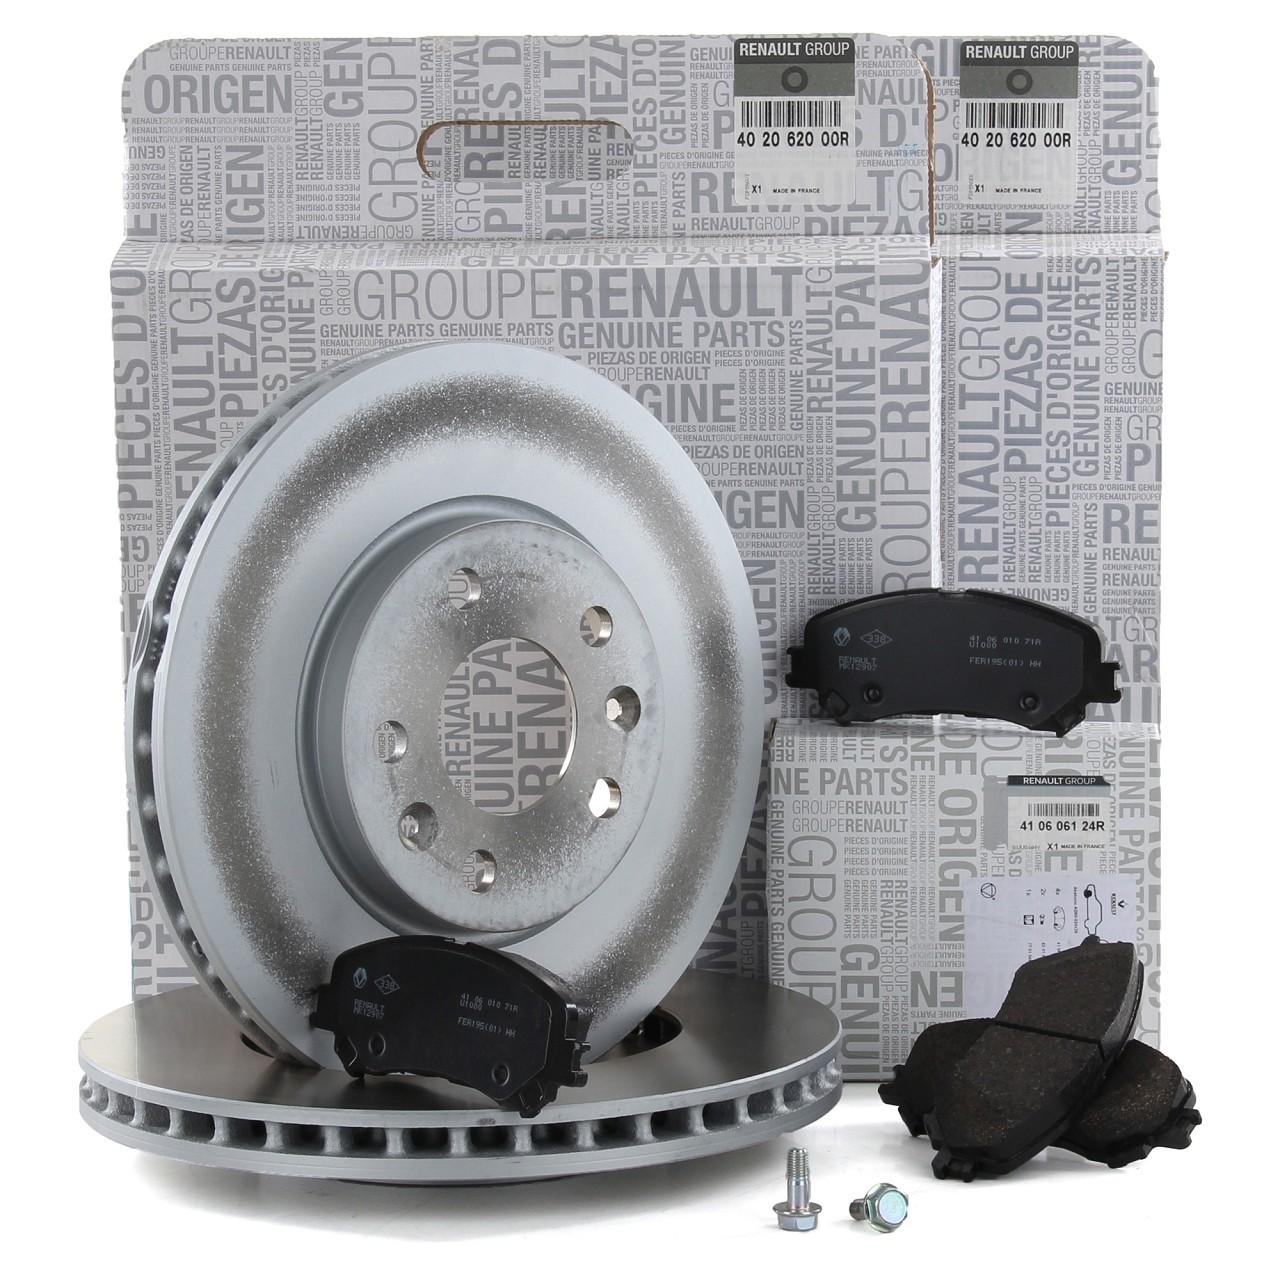 ORIGINAL Renault Bremsen Bremsscheiben + Bremsbeläge MEGANE IV TALISMAN vorne